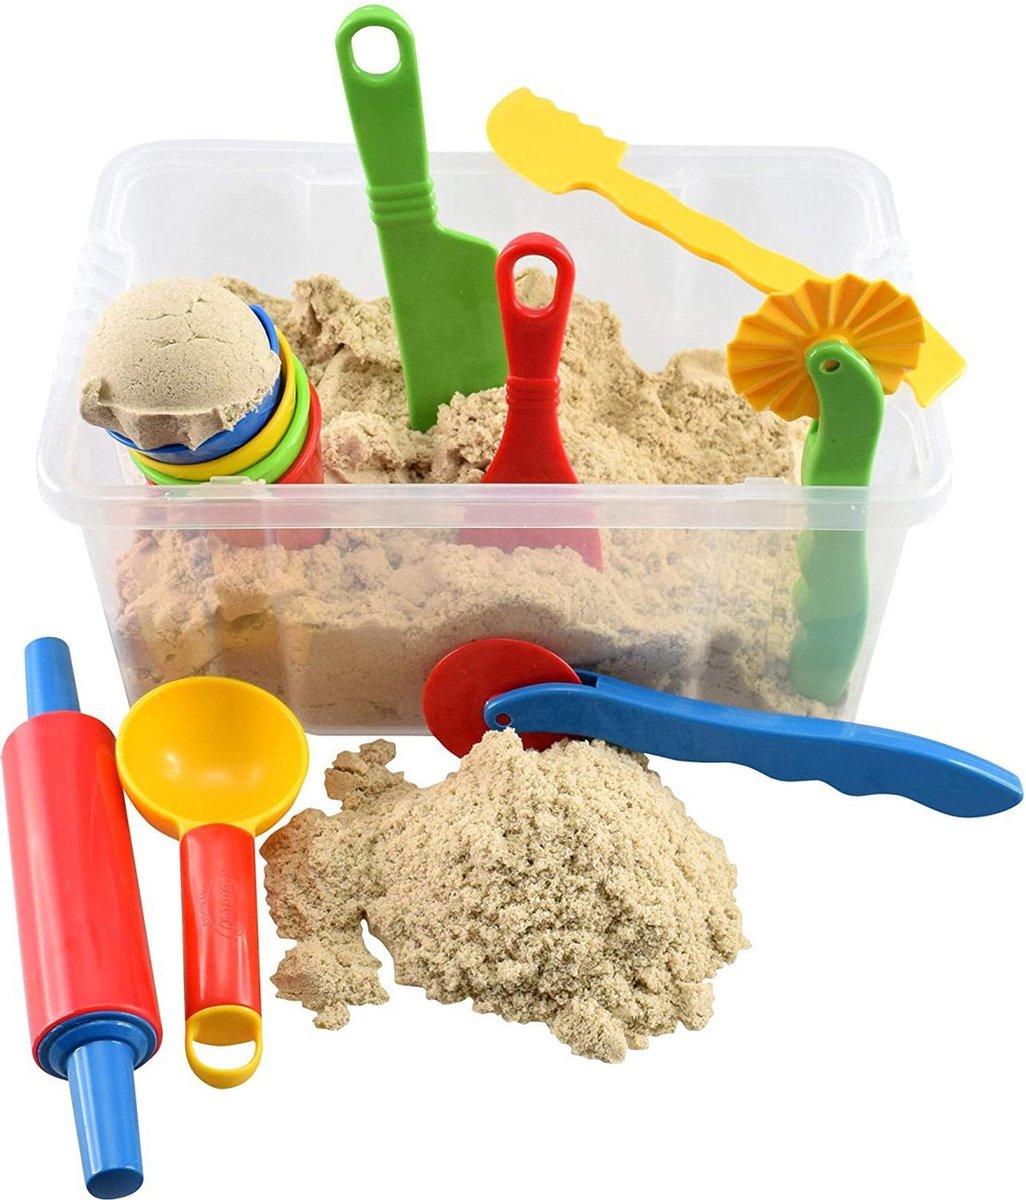 Kinetic Sand WABA Fun set van 2,5 kg in schatkist 13 stuks. speelzand kinderen